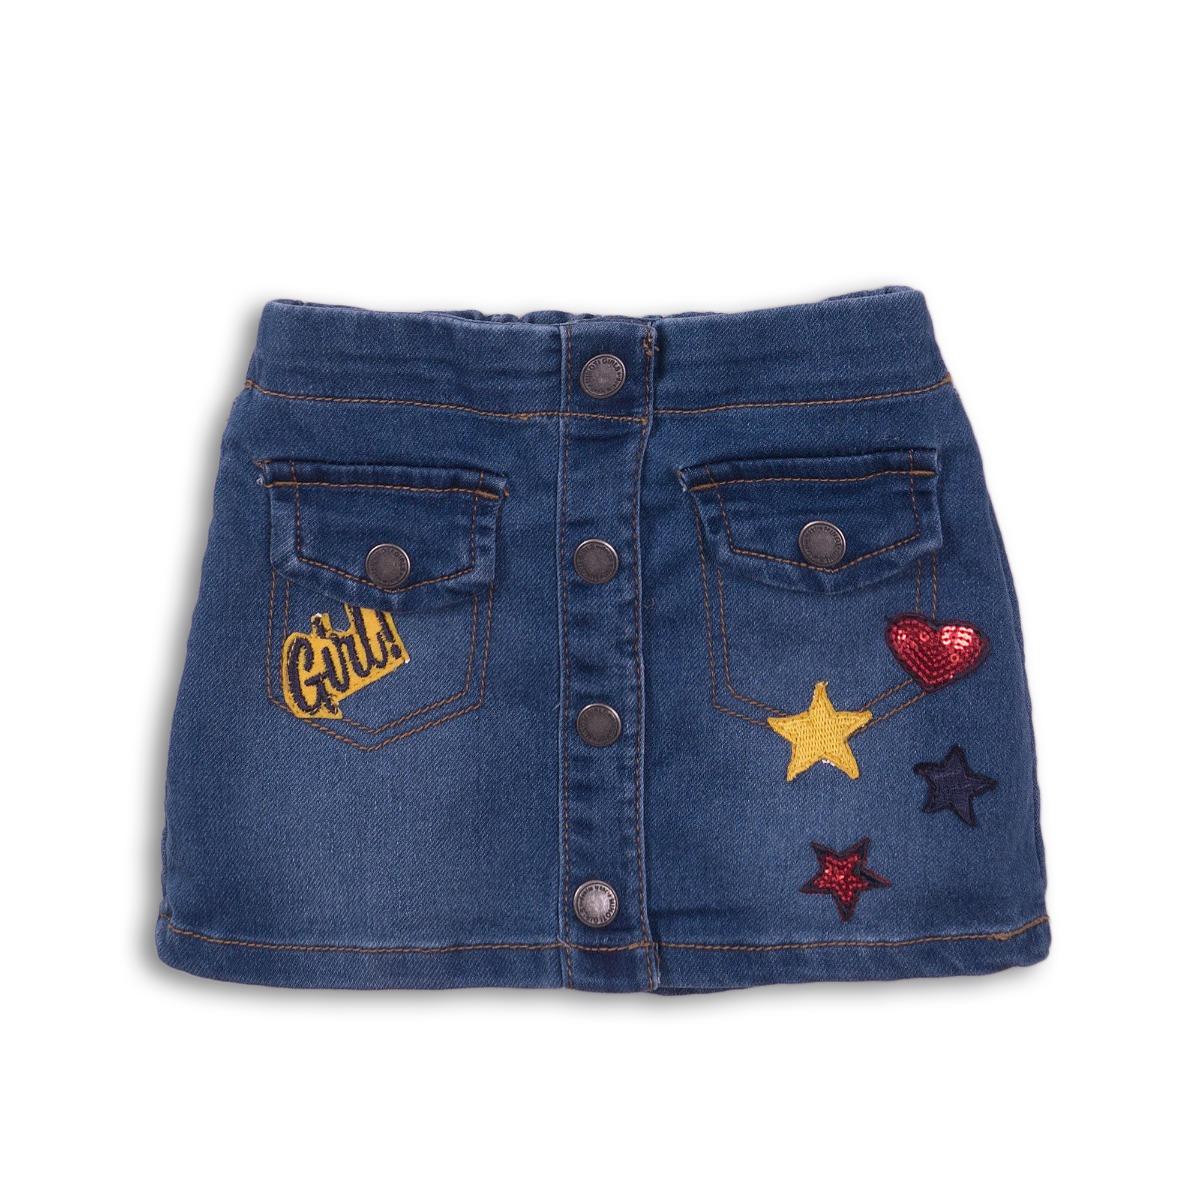 Fusta jeans cu nasturi Minoti Girl imagine